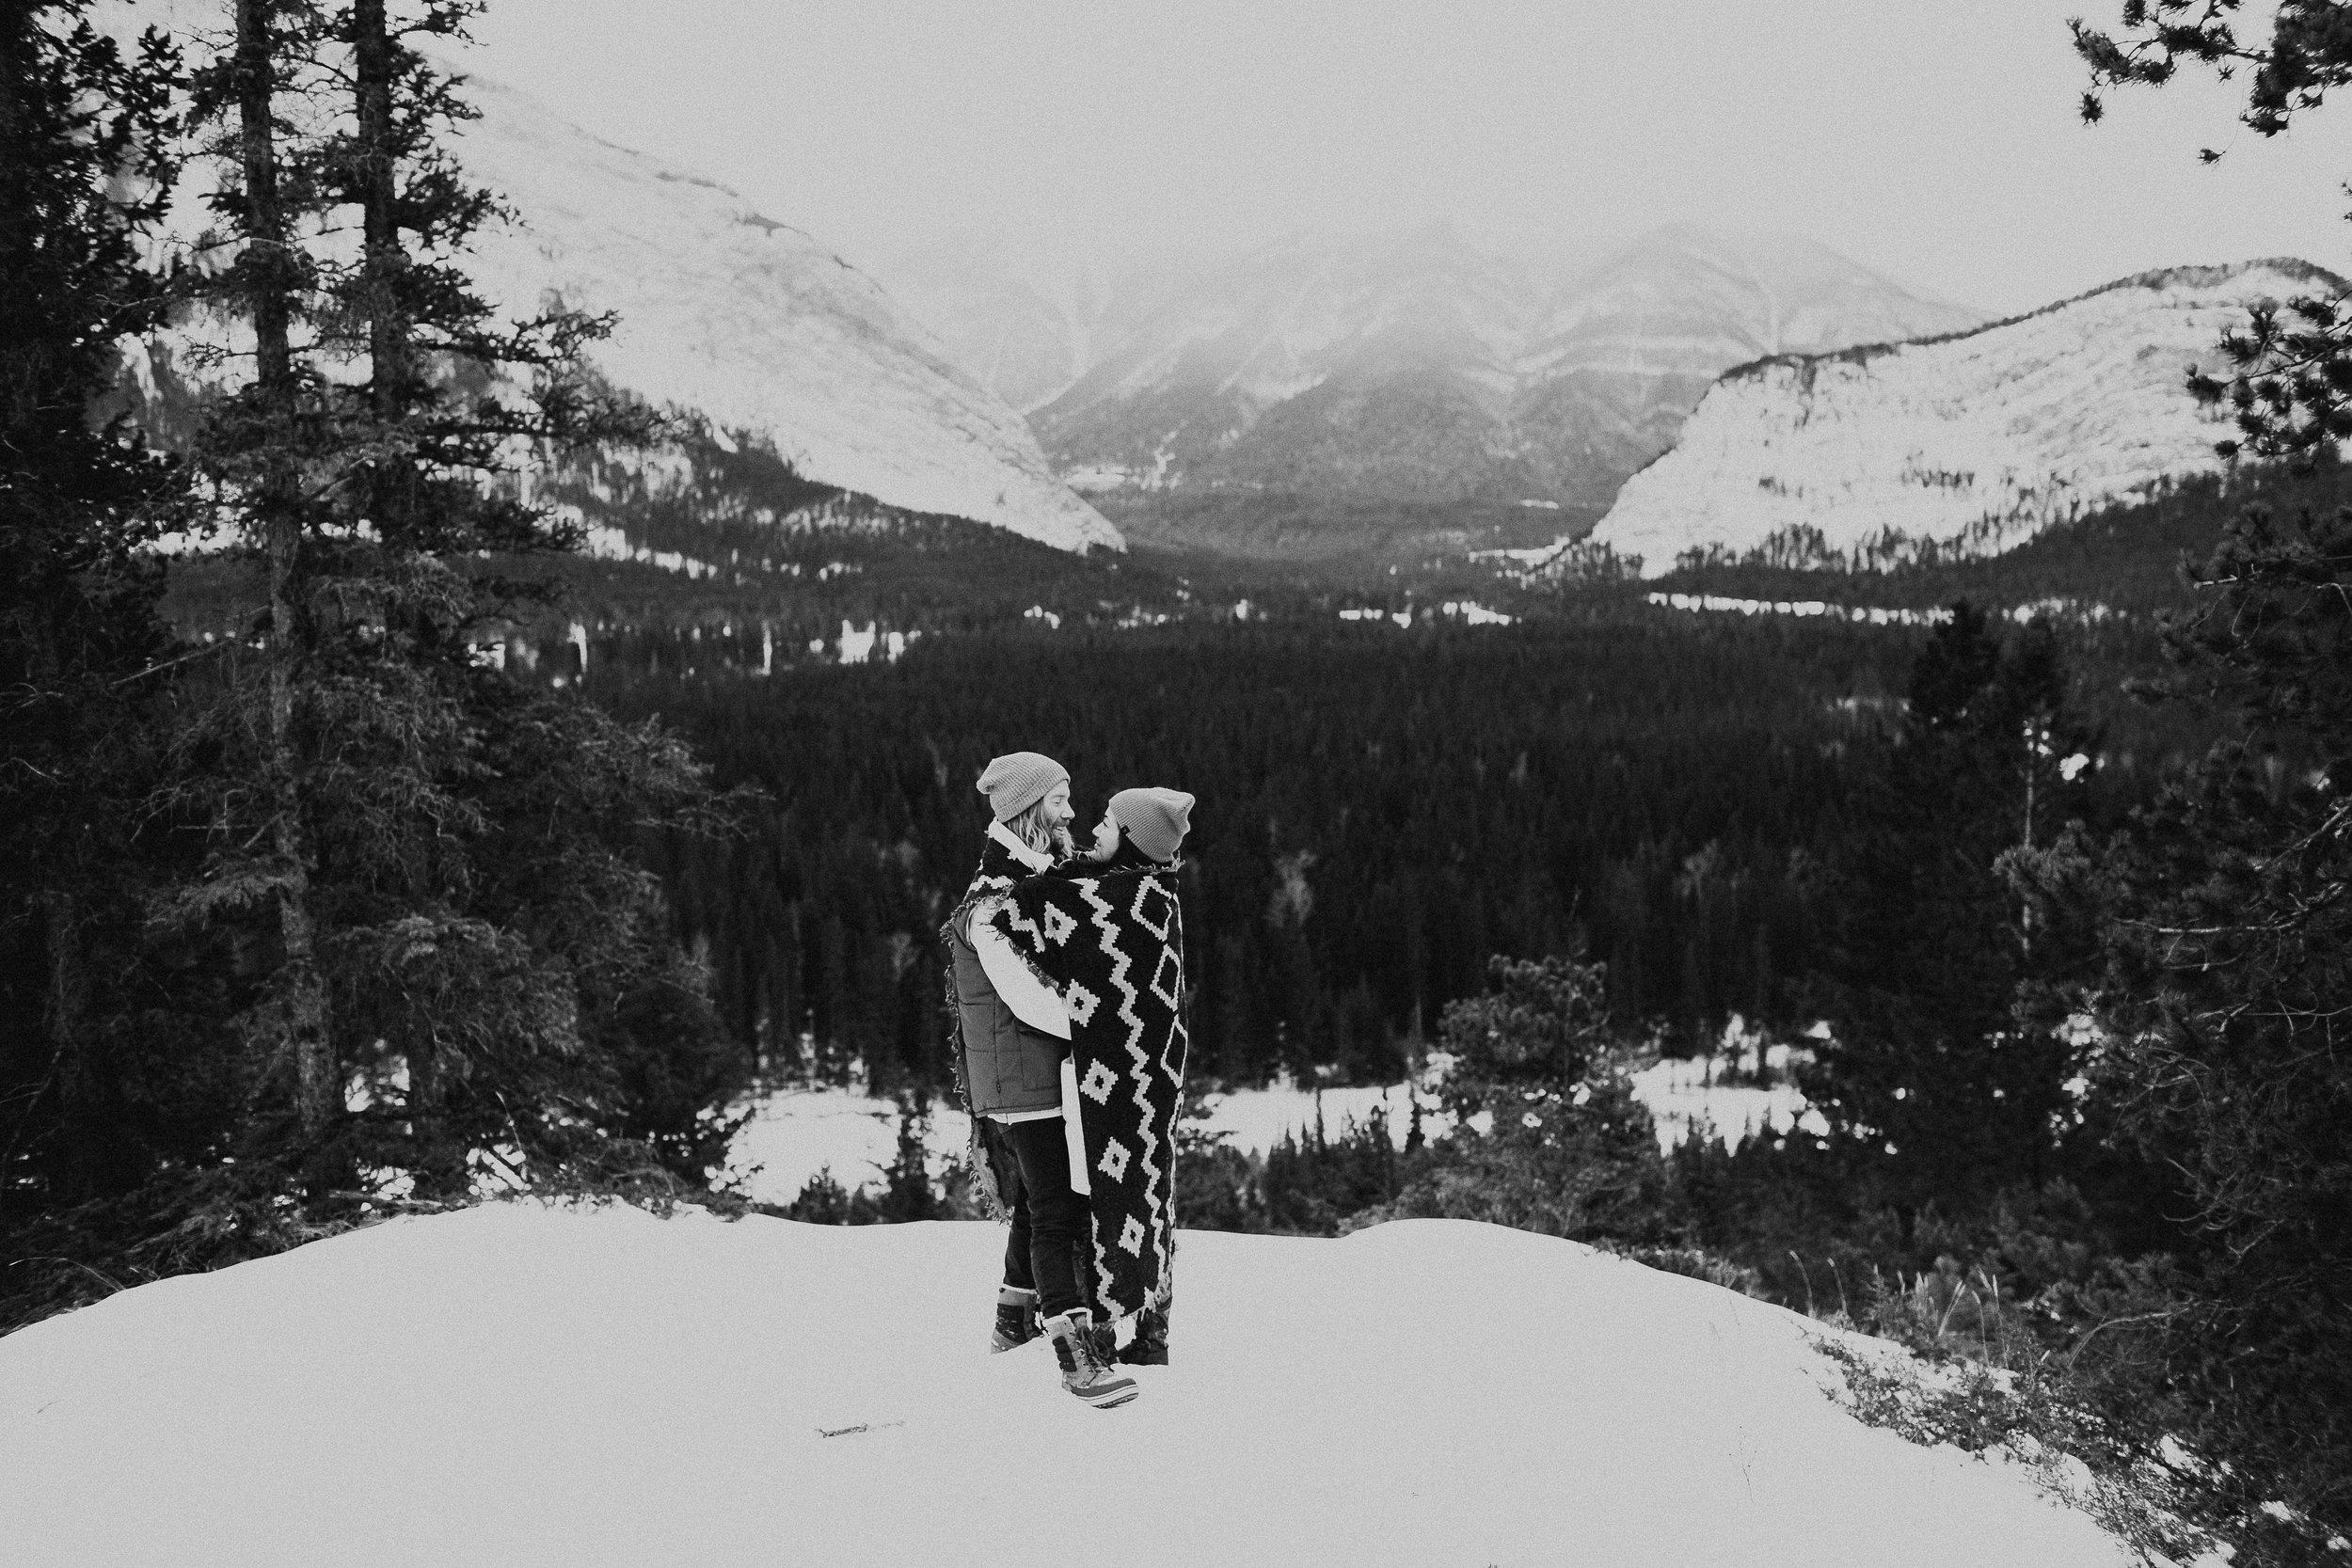 Banff Engagement Photographer - Winter Mountain Adventure Engagement Session - Michelle Larmand Photography-020